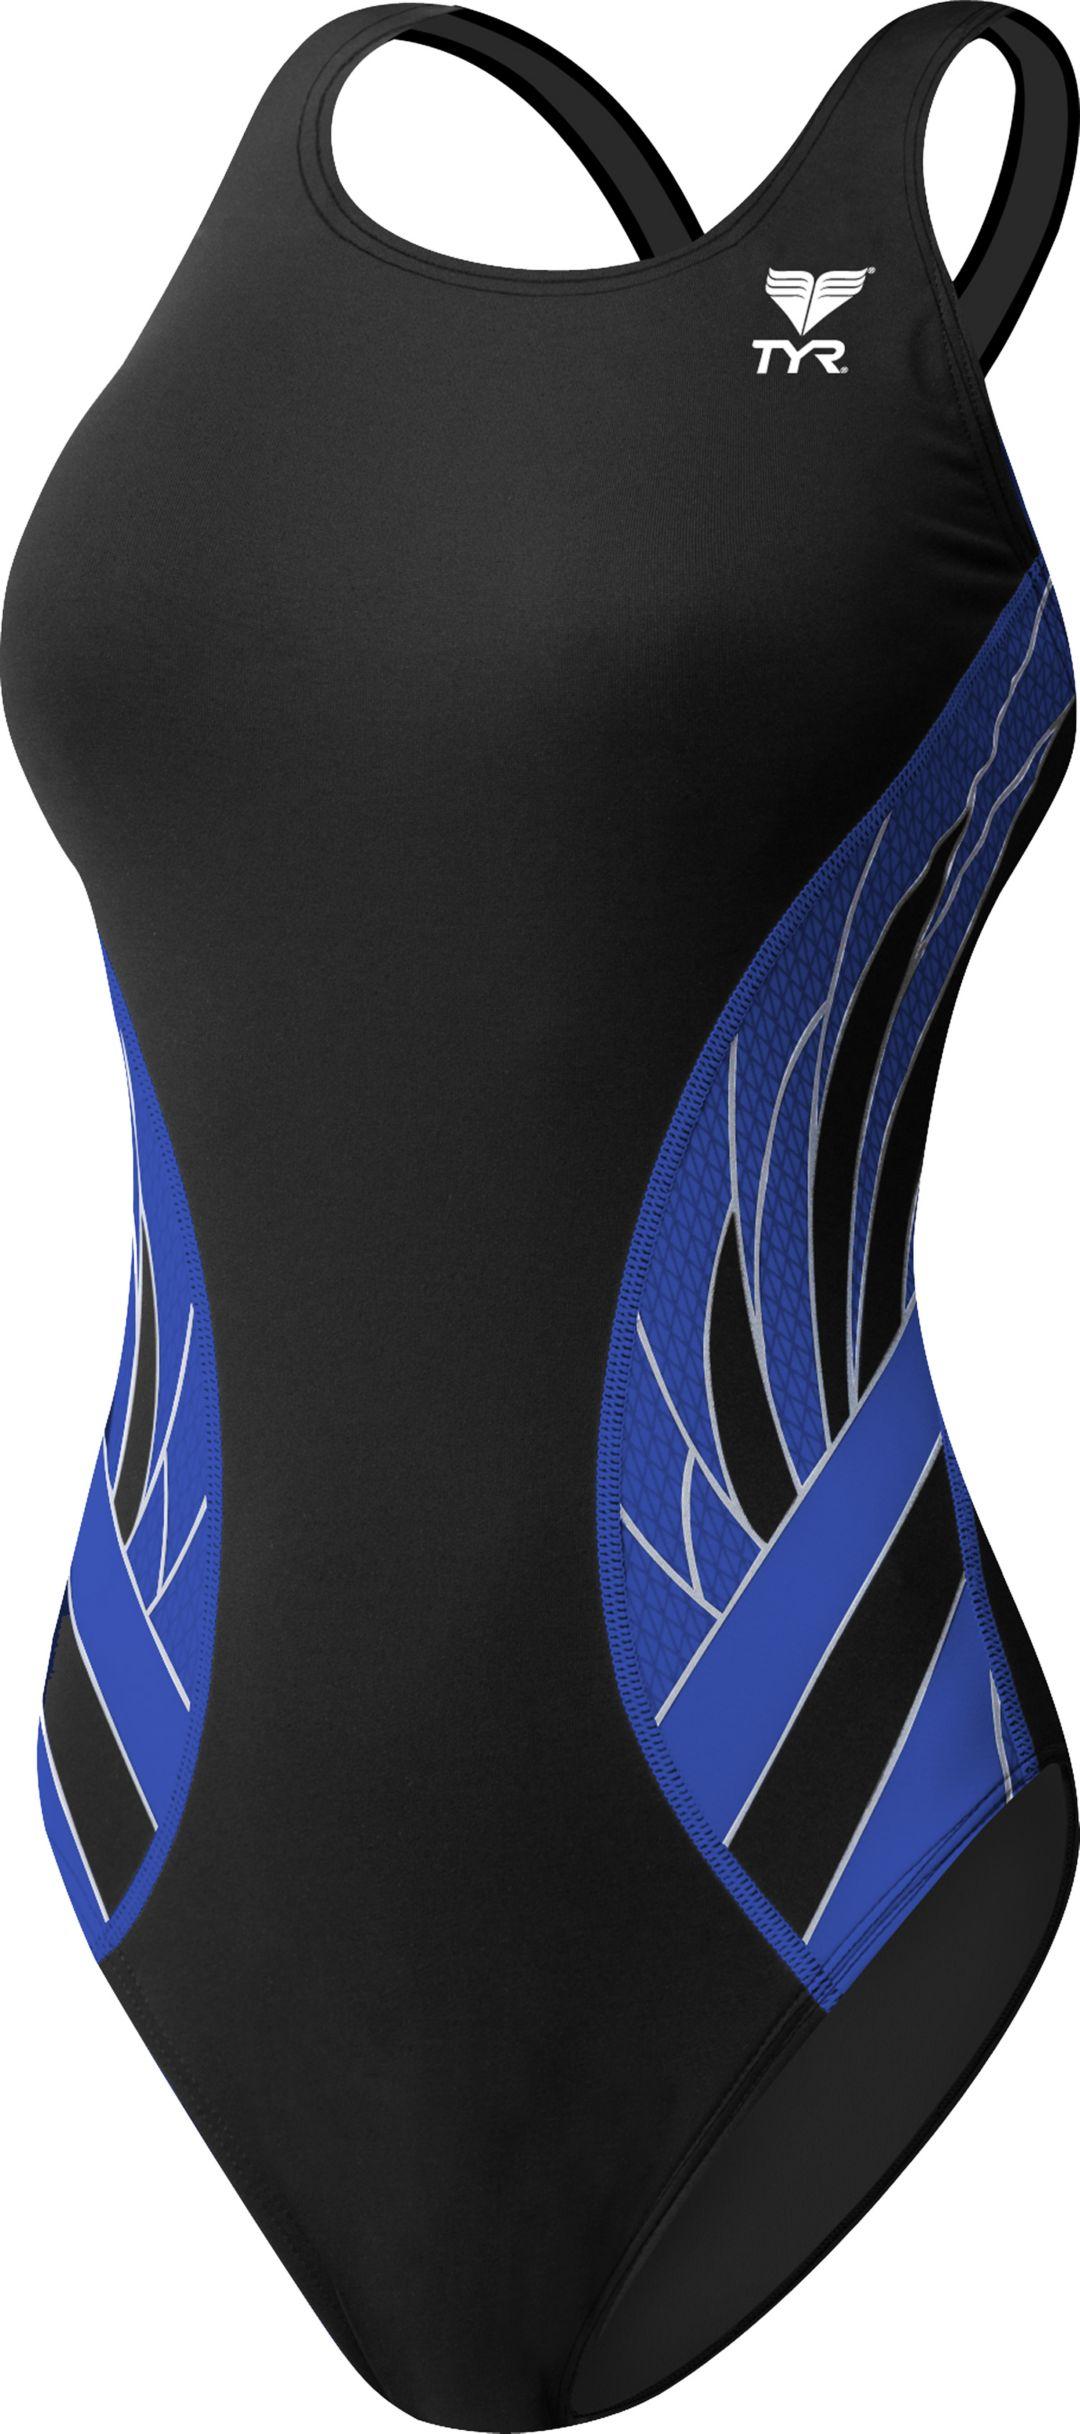 defadf6a9a1 TYR Women's Phoenix Maxfit Back Swimsuit | DICK'S Sporting Goods